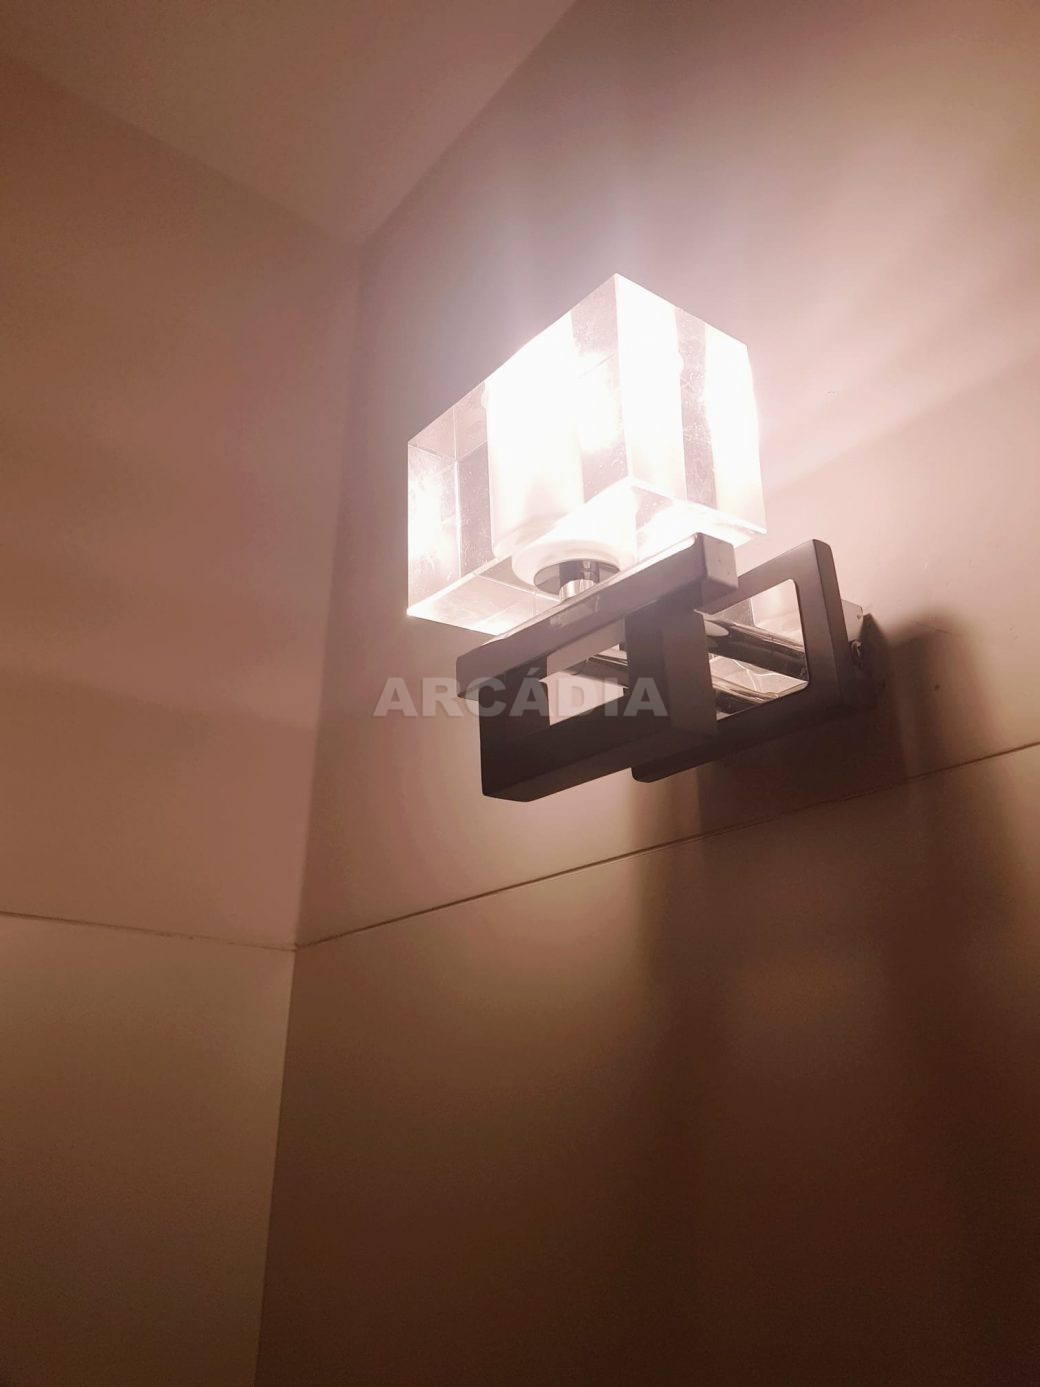 arcadia-imobiliaria-braga-apartamento-no-centro-historico-de-braga-tipo-2-para-compra-7-1